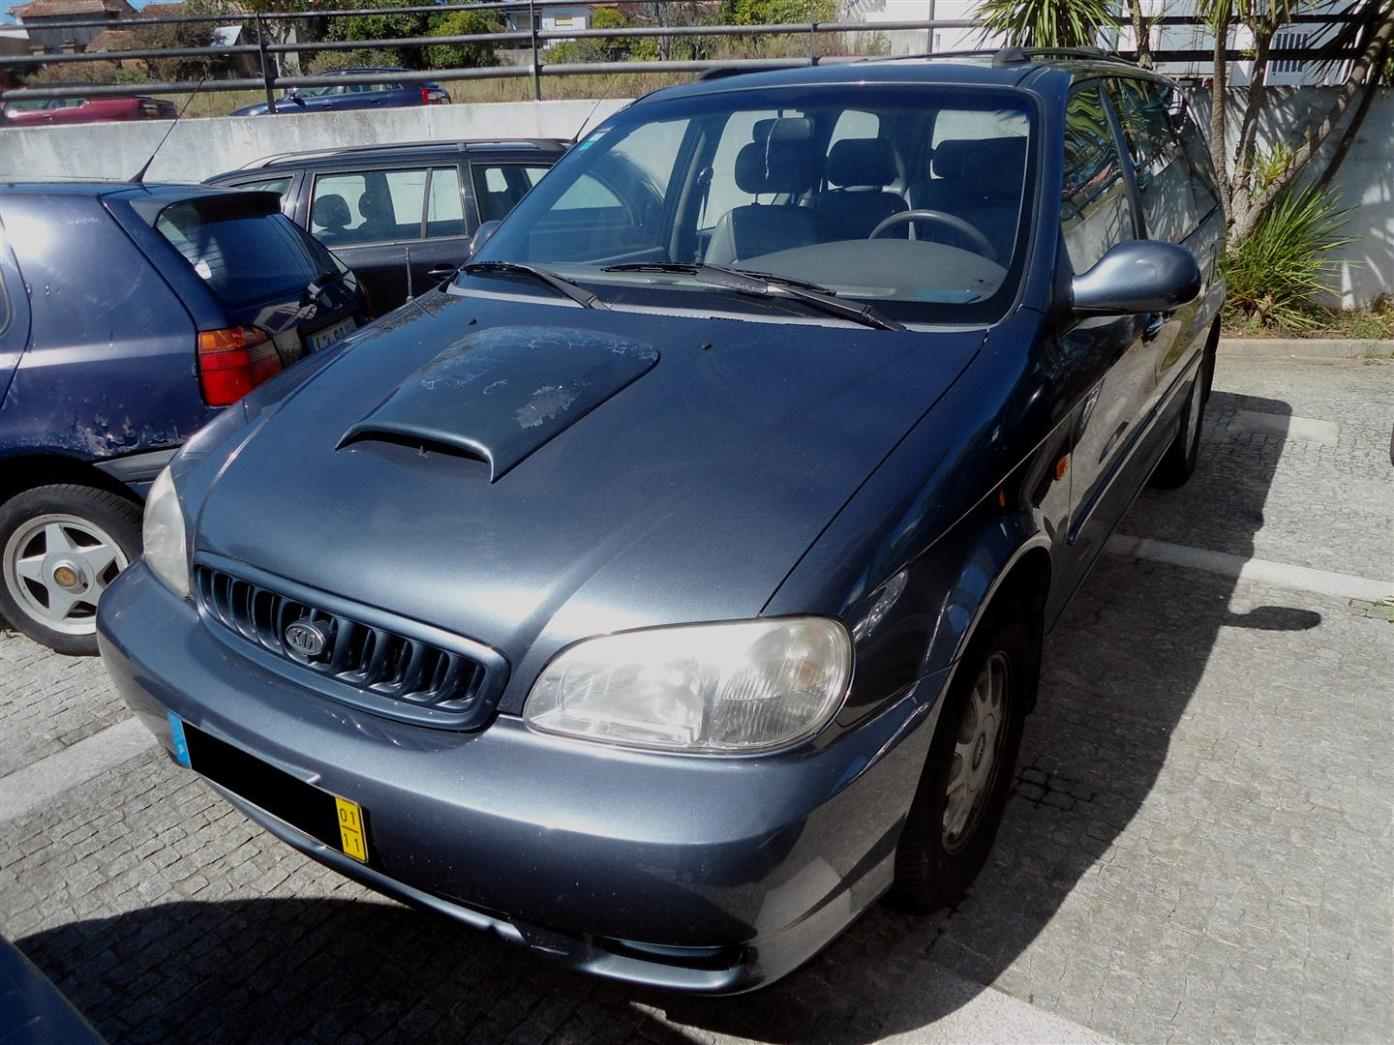 MG Ribeiro Motores - Comércio de Automóveis: Kia Carnival 2.9 TDi - 5.600 €